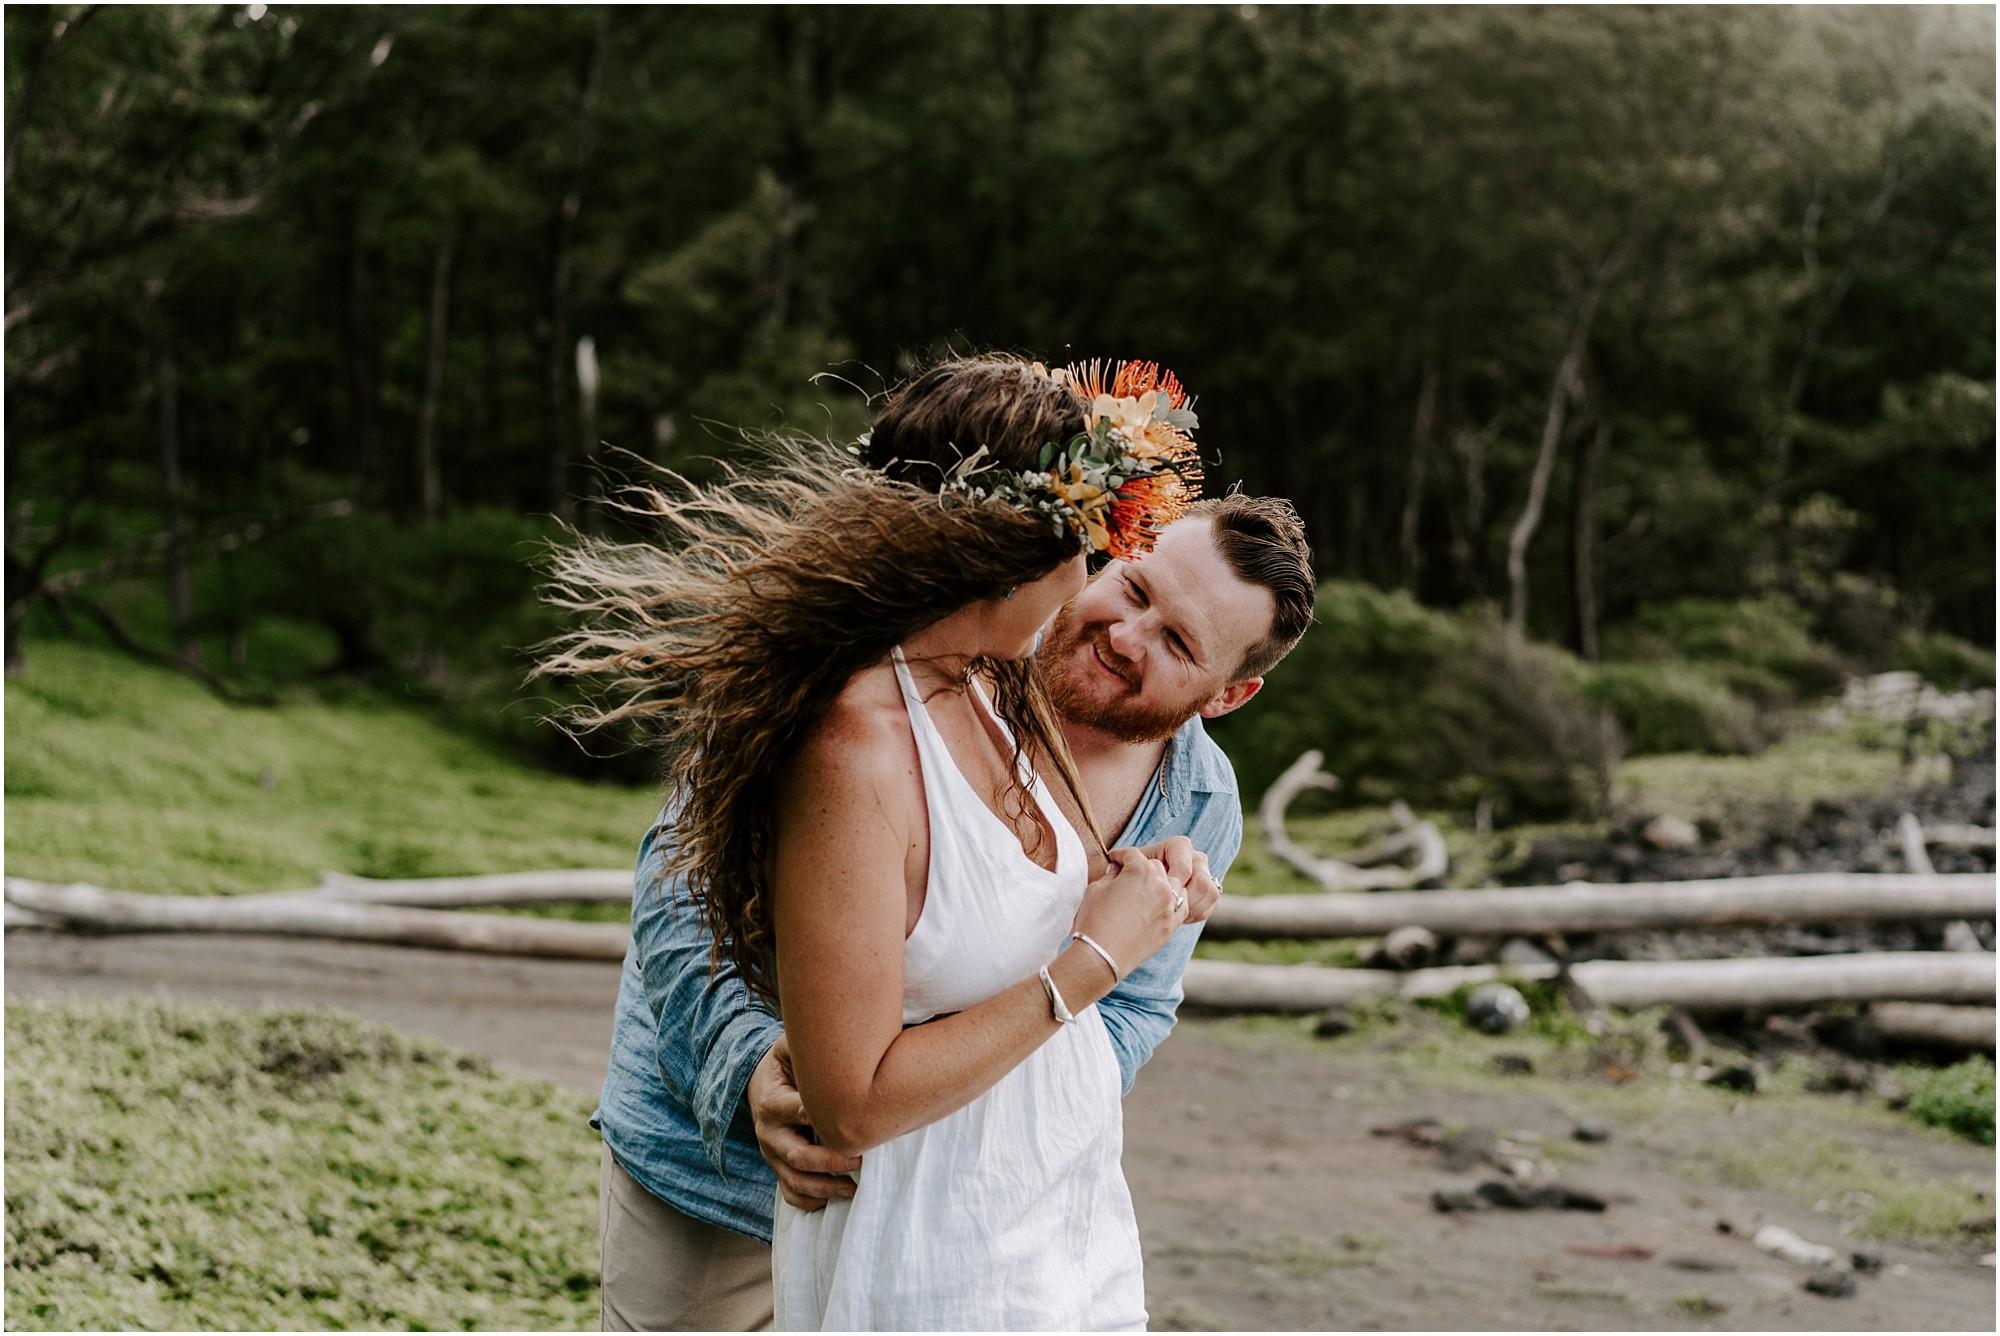 big-island-valley-proposal-hawaii-elopement-photographer_0043.jpg